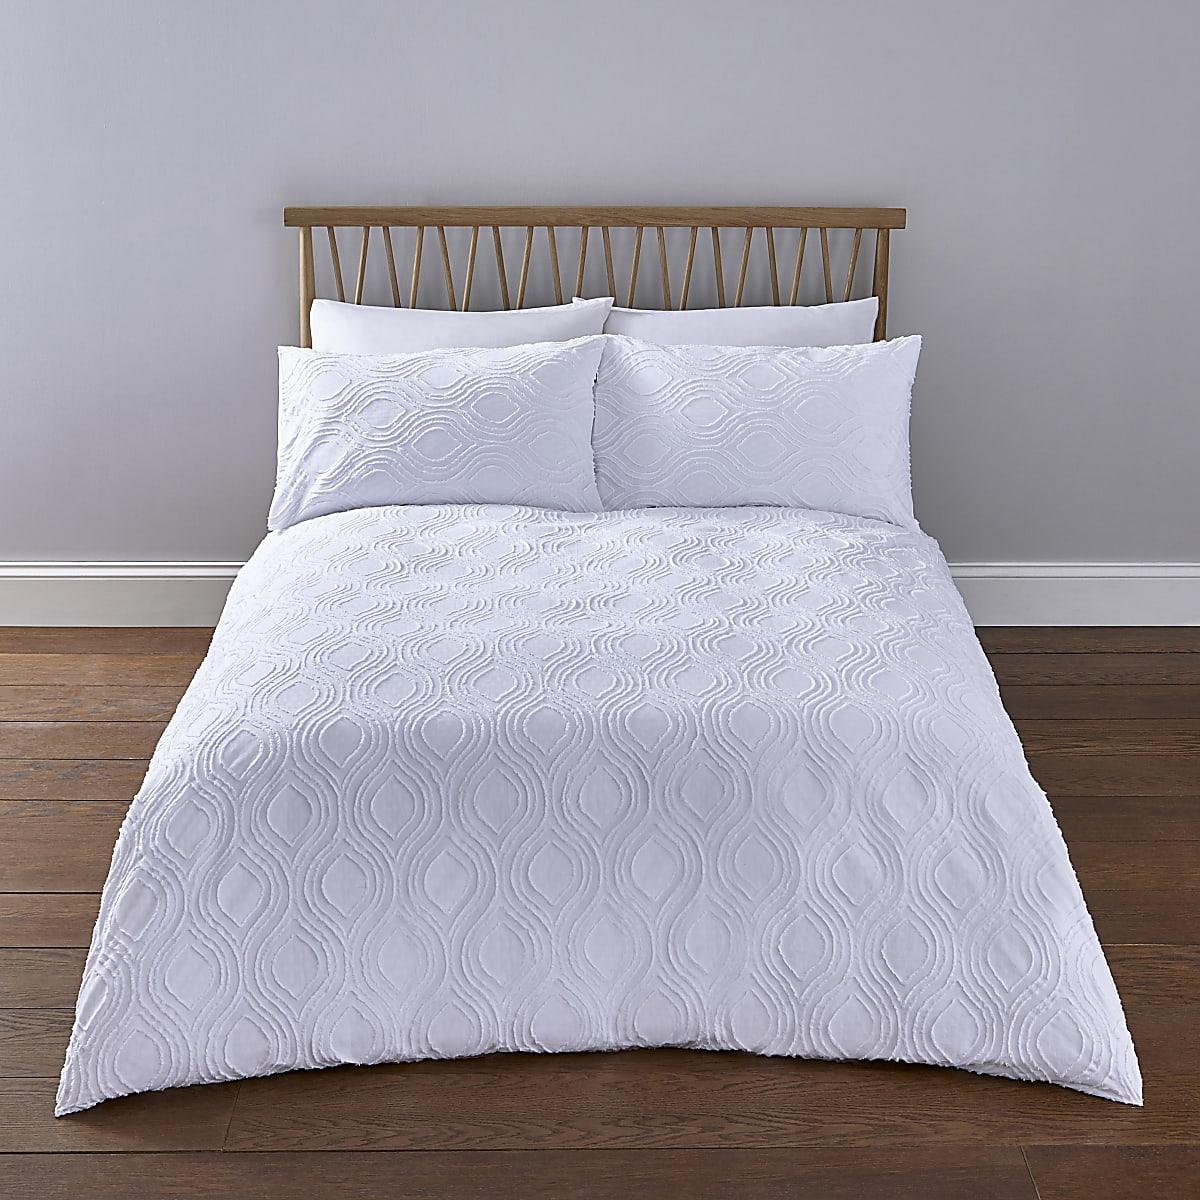 White geo textured king duvet bed set